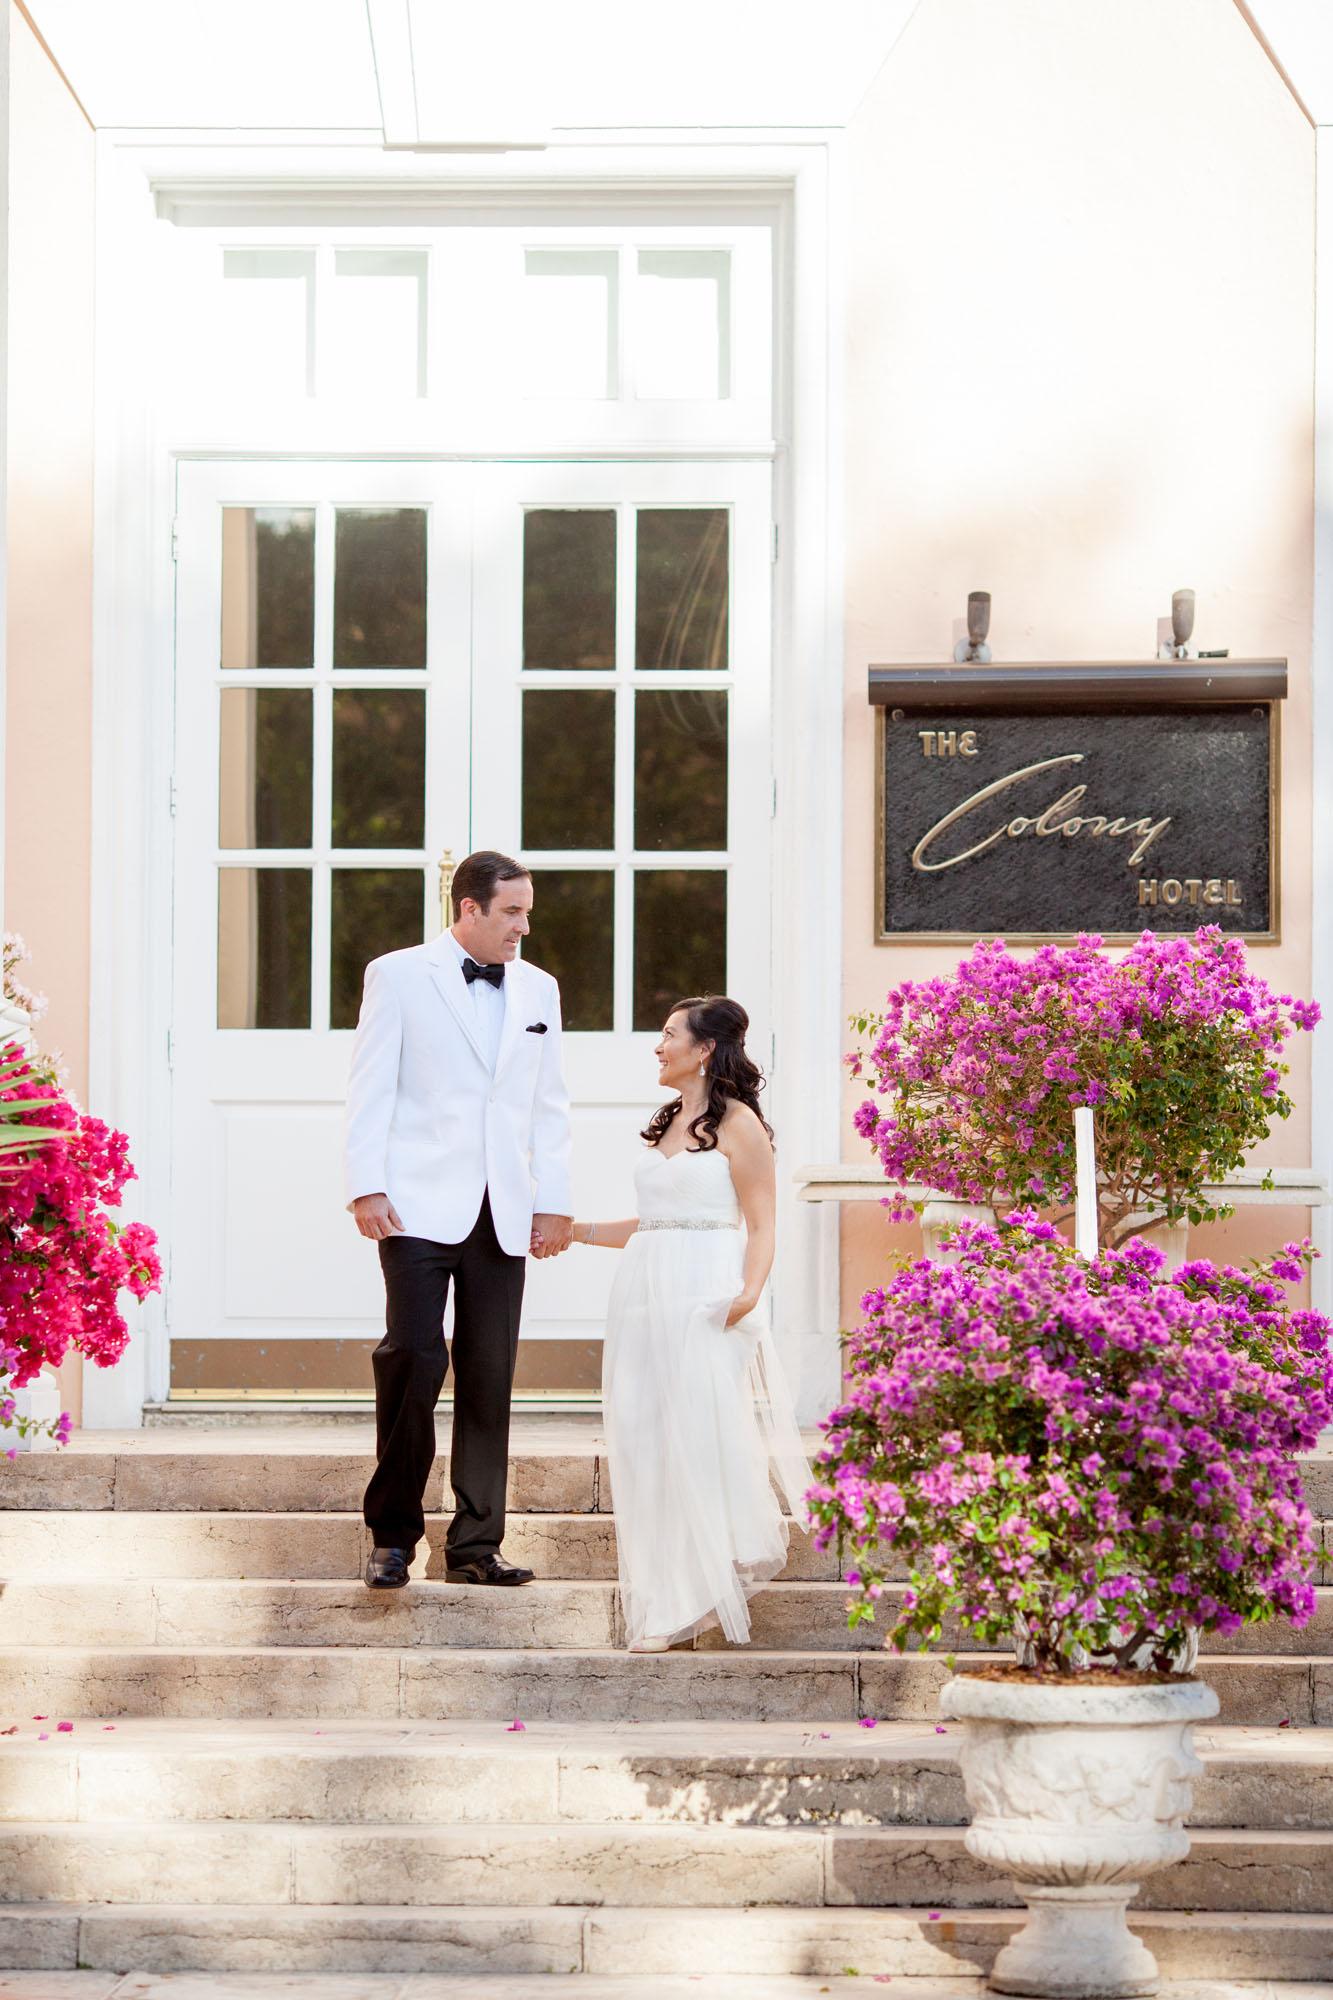 The Colony Palm Beach Wedding | Sara Kauss Photography